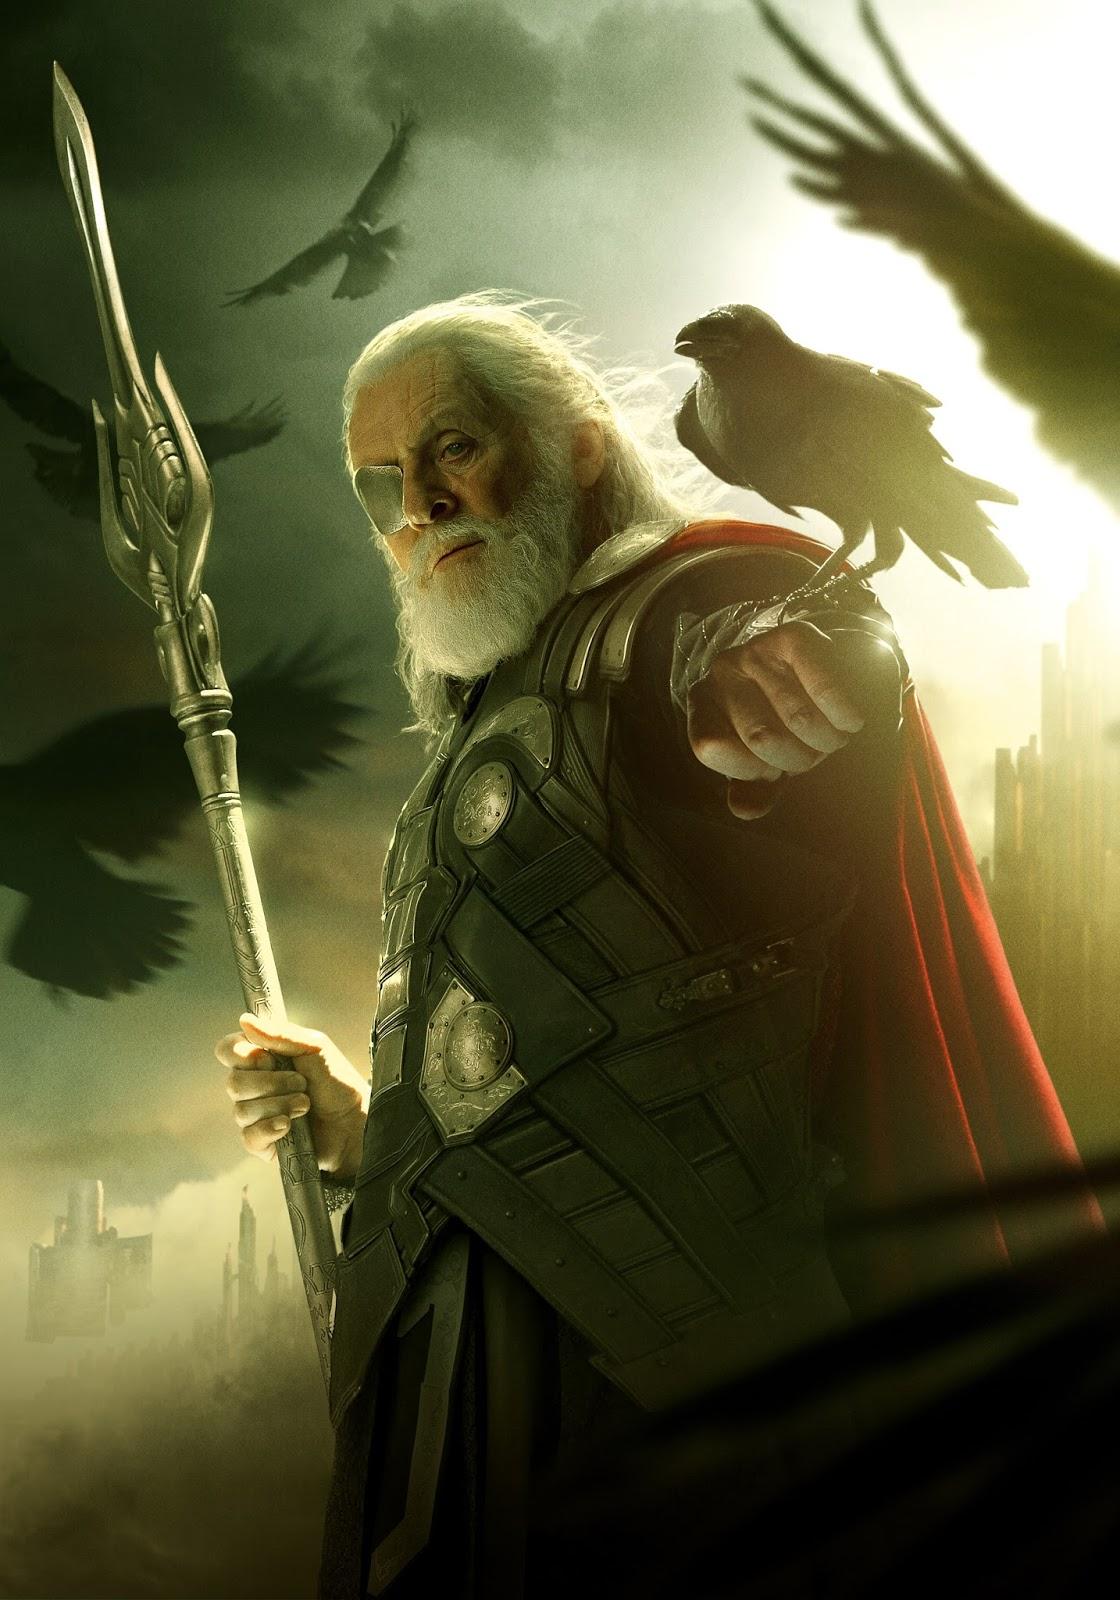 Thor the dark world 1848489489489458